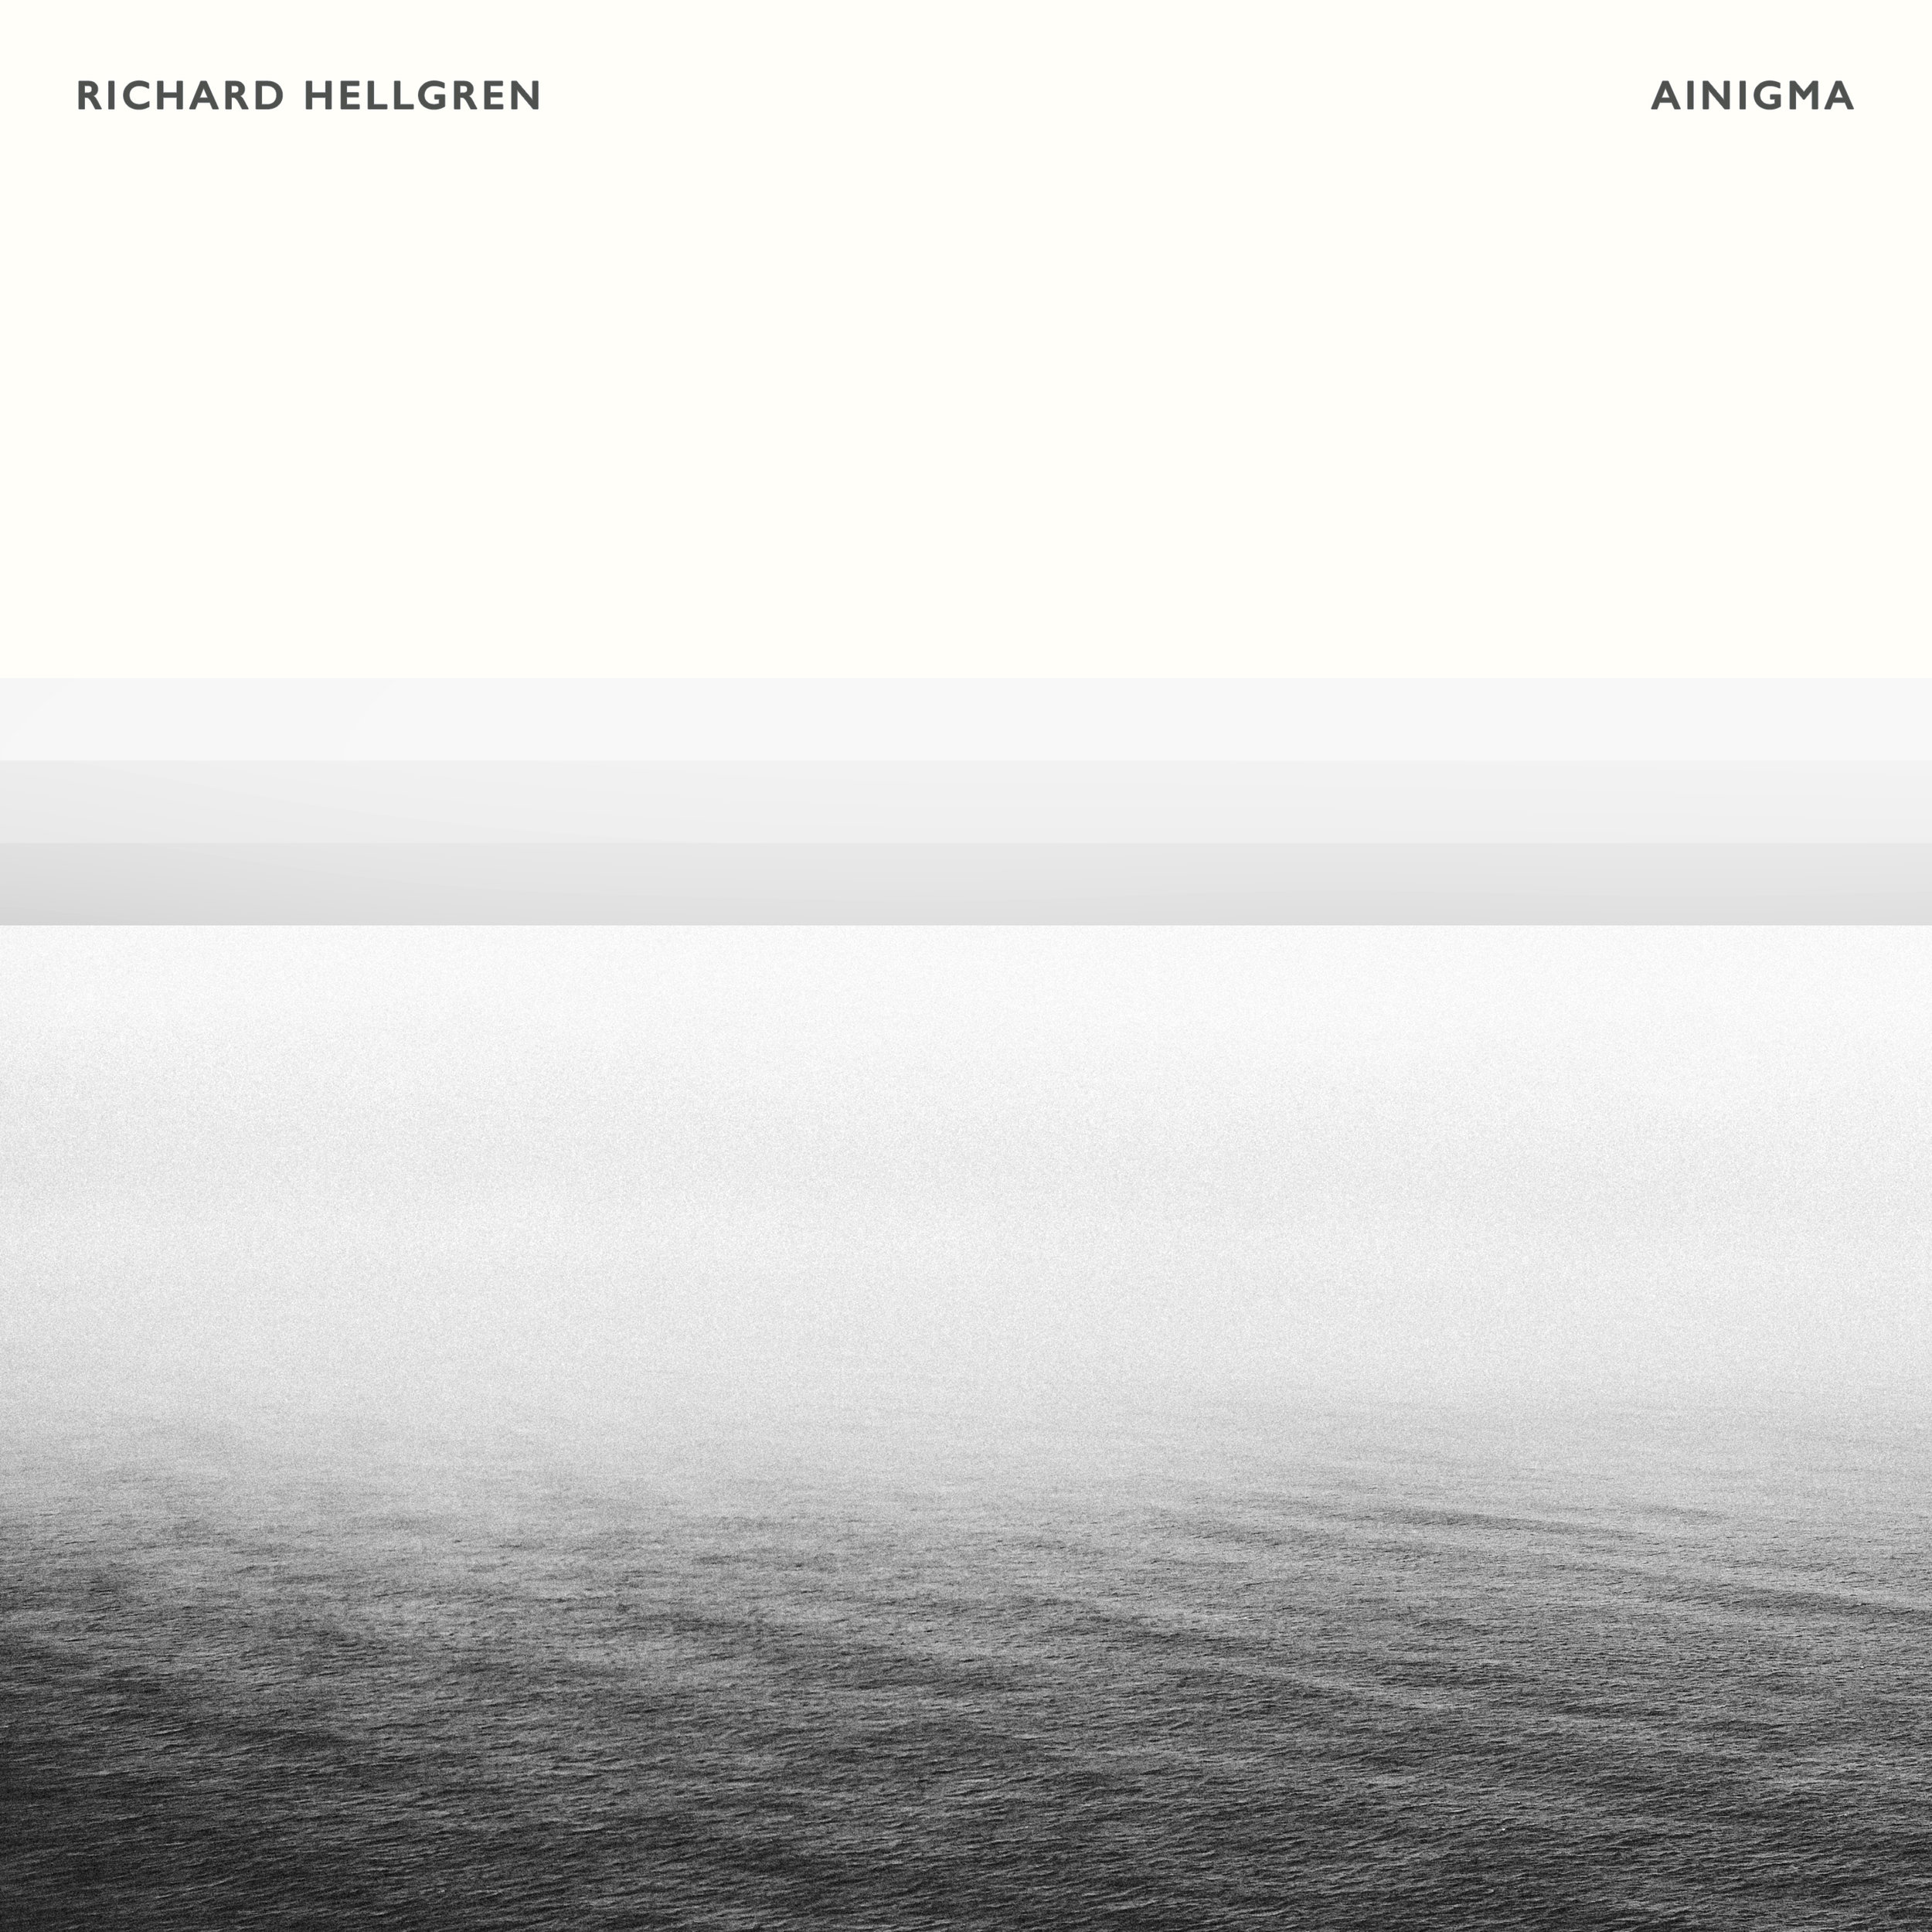 Richard Hellgren - Ainigma